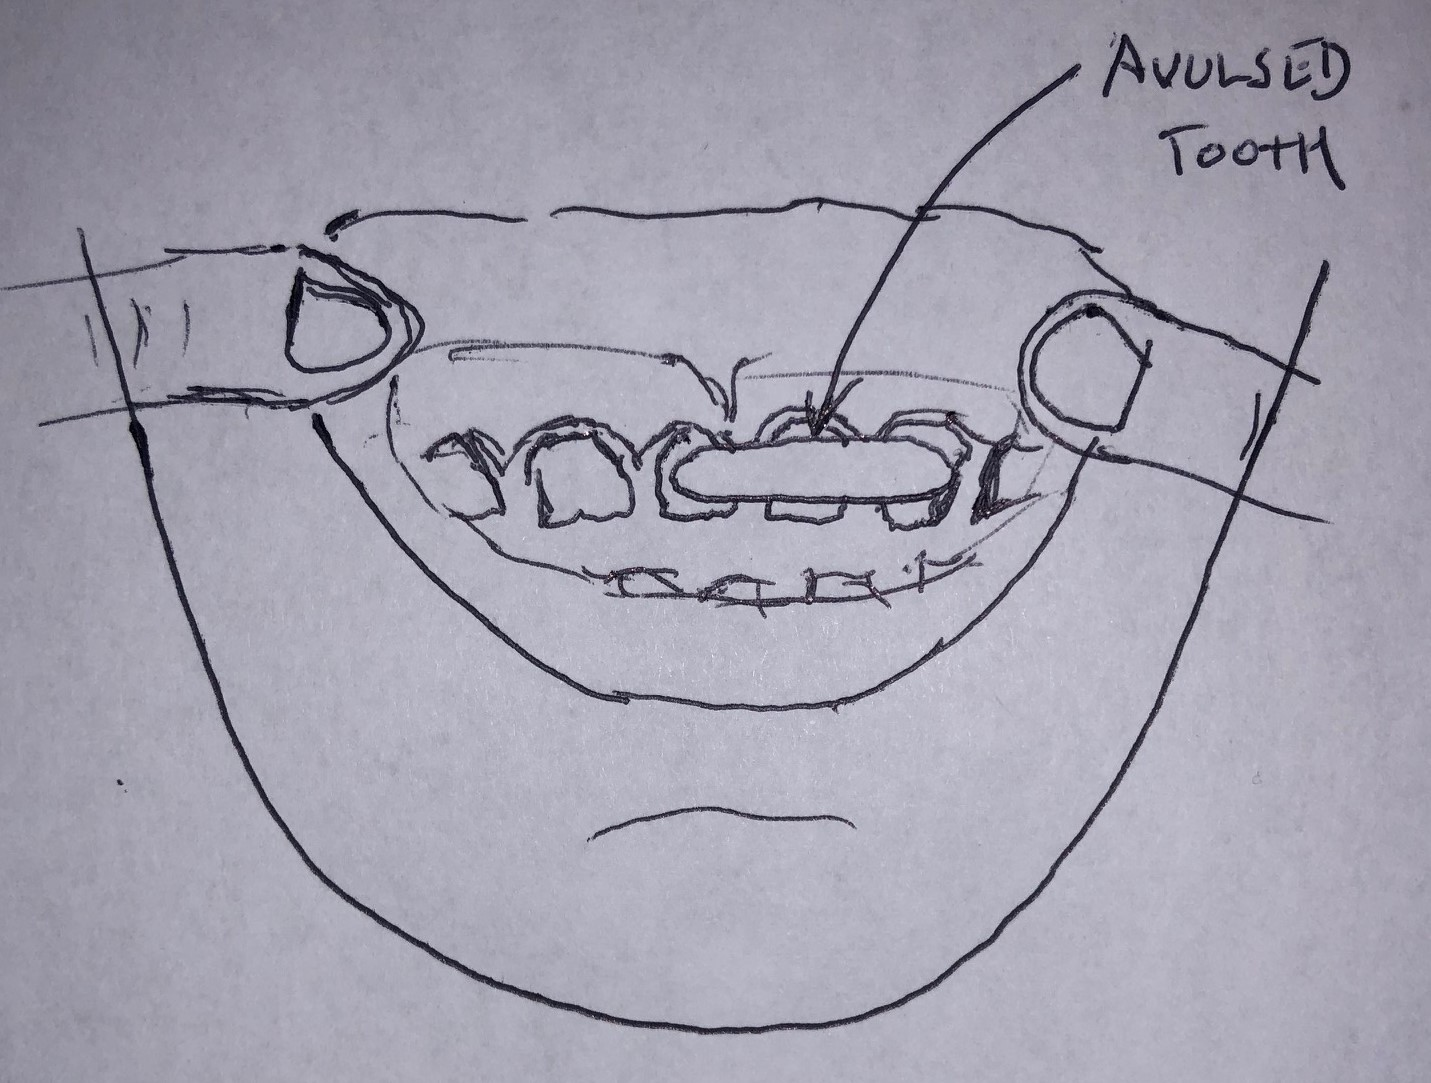 tooth-drawing.jpg